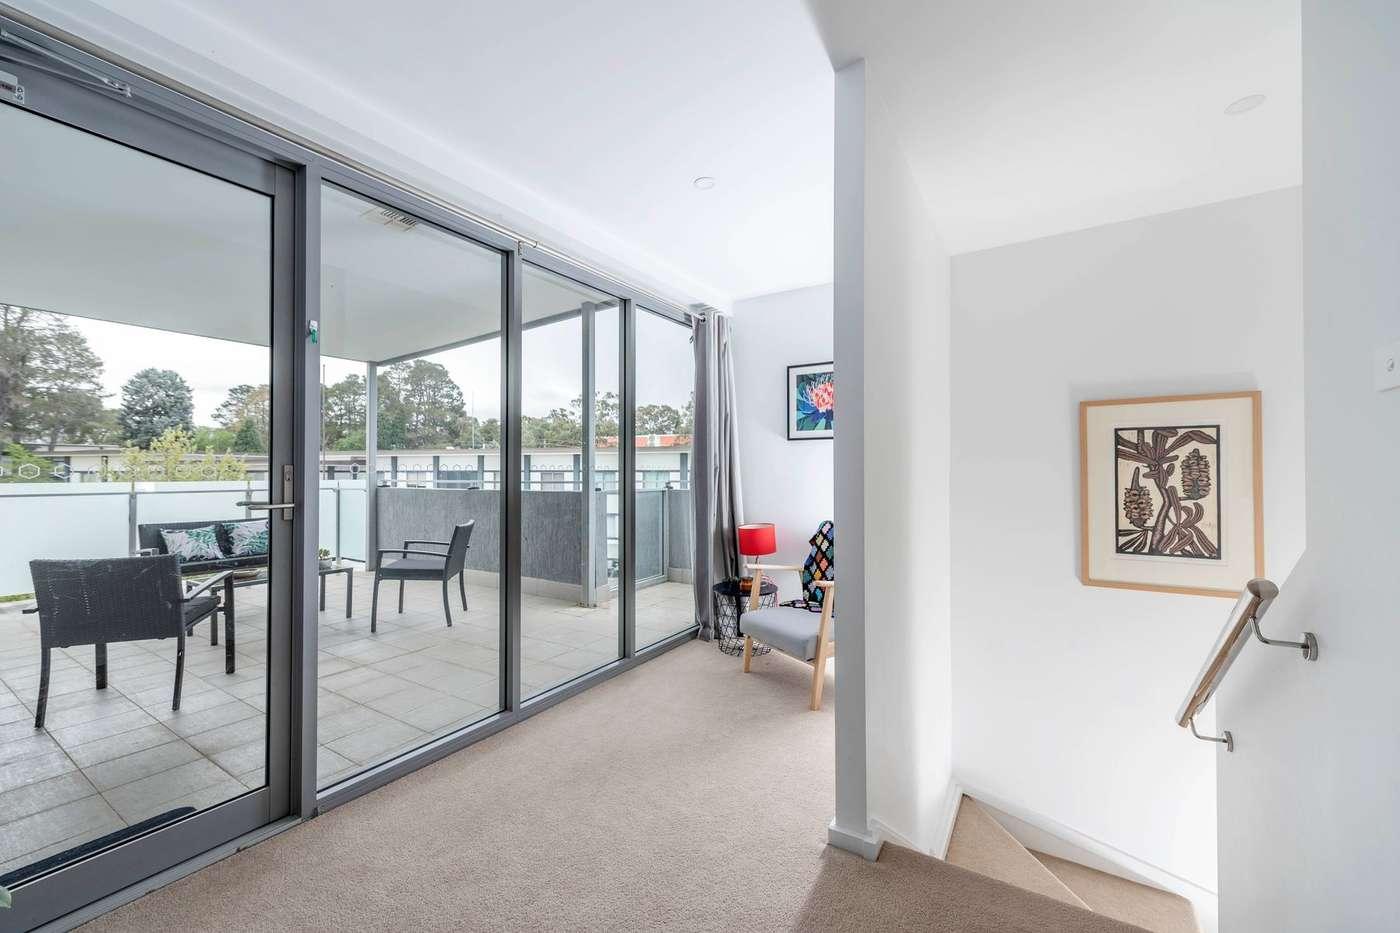 Main view of Homely apartment listing, 28/41 Hampton Circuit, Yarralumla, ACT 2600